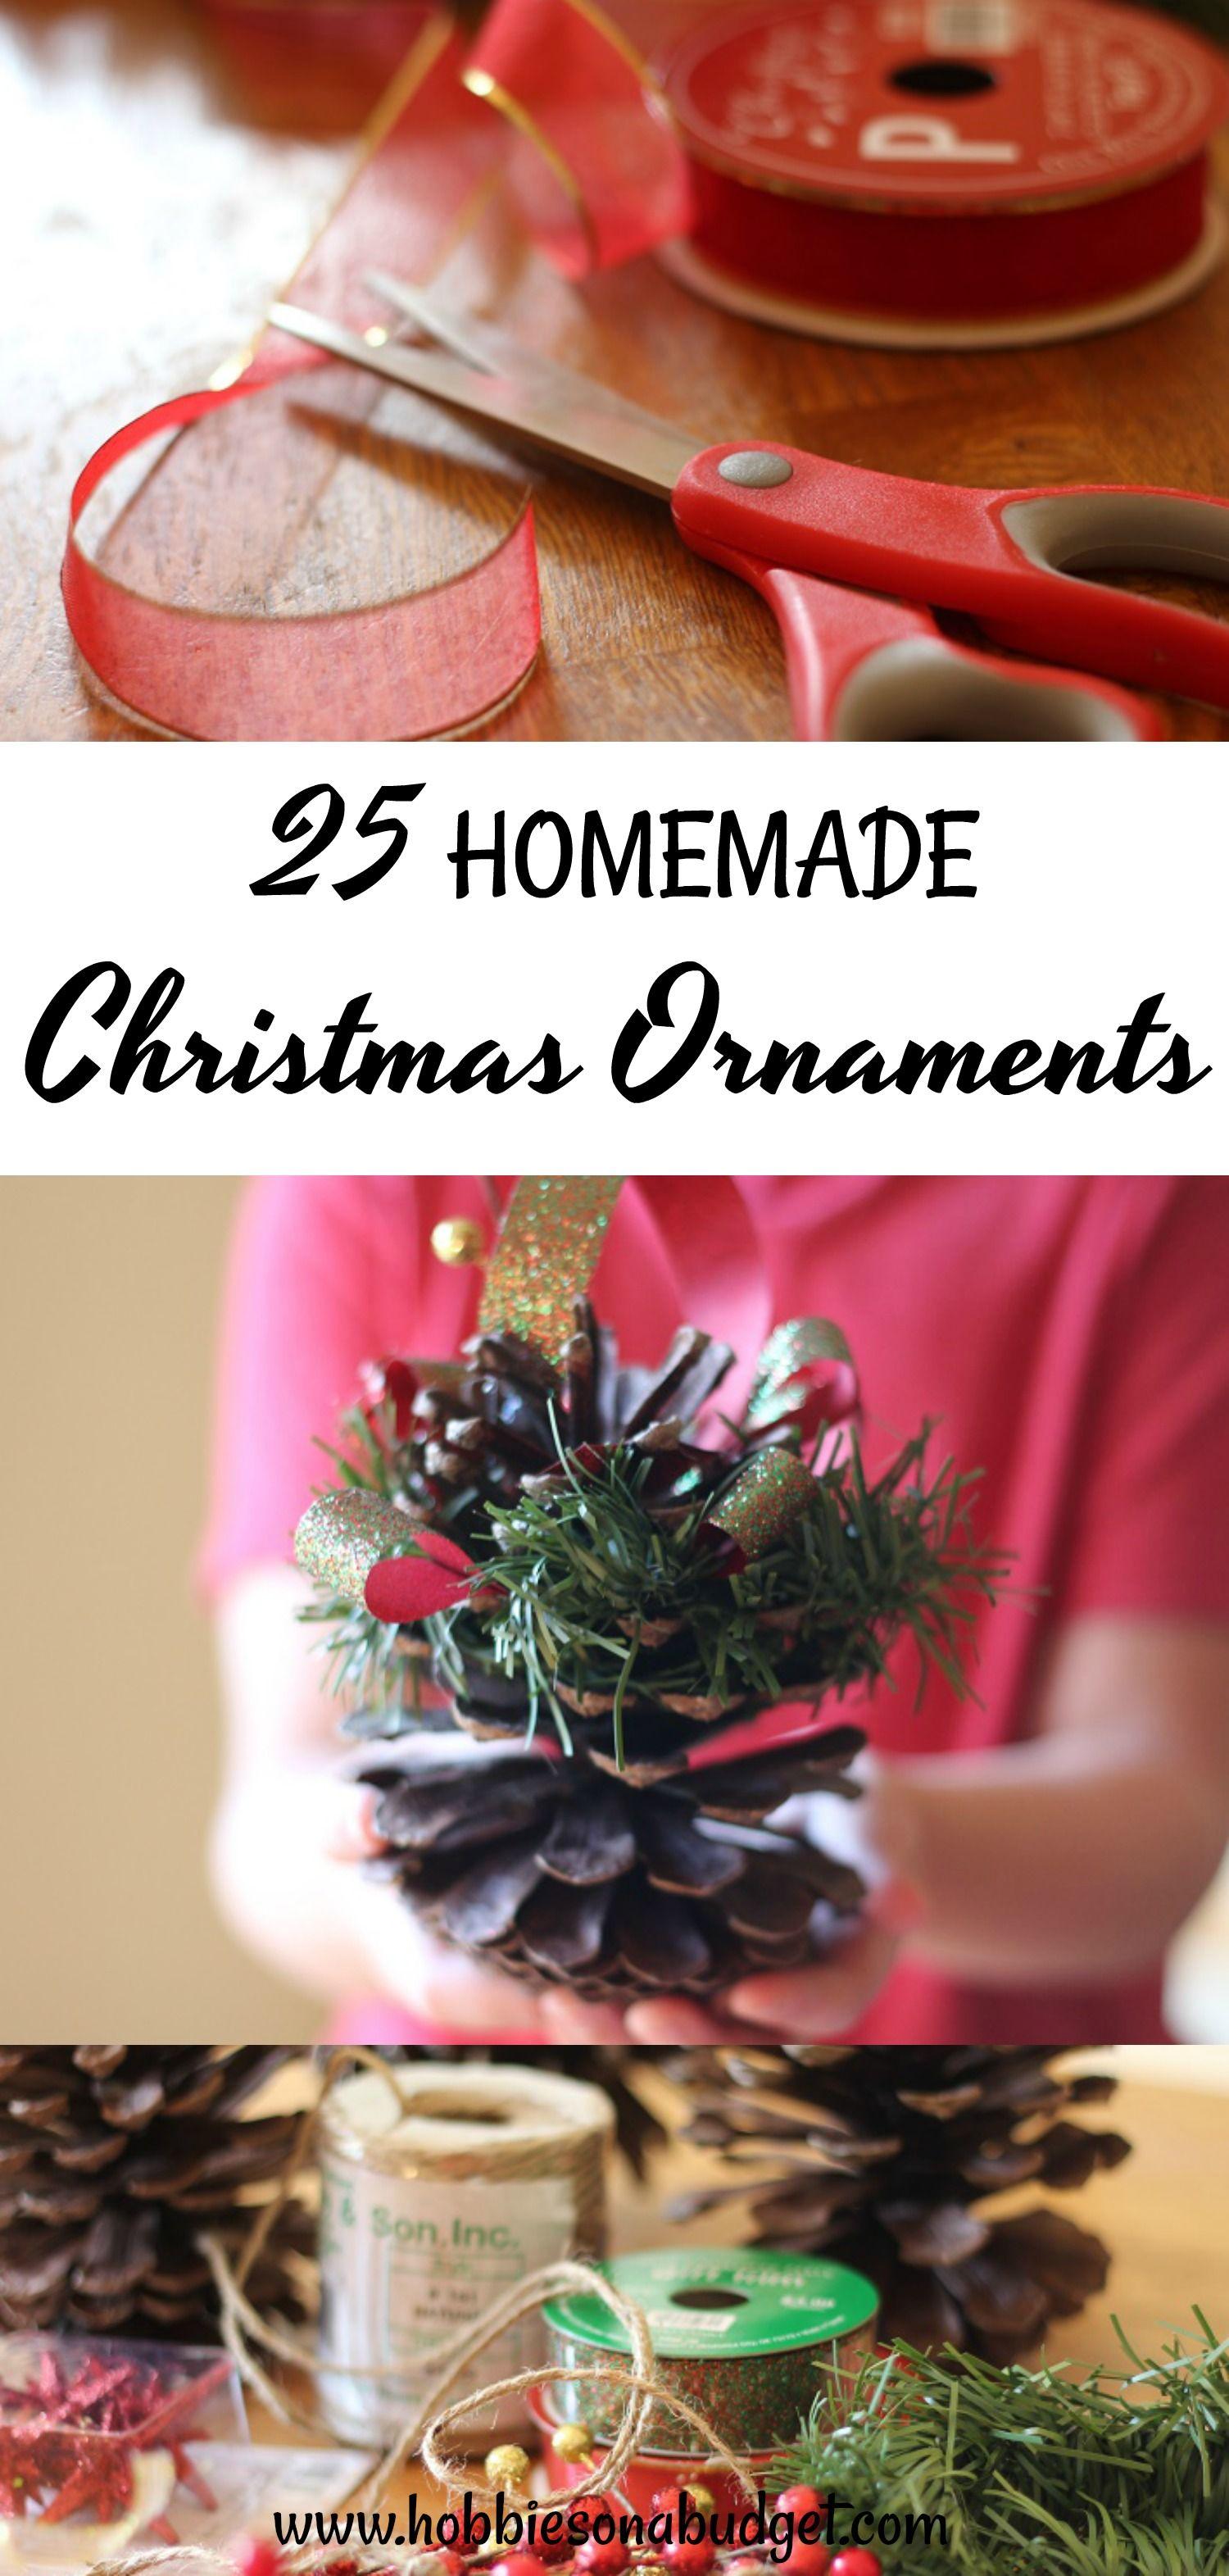 25 Homemade Christmas Ornaments